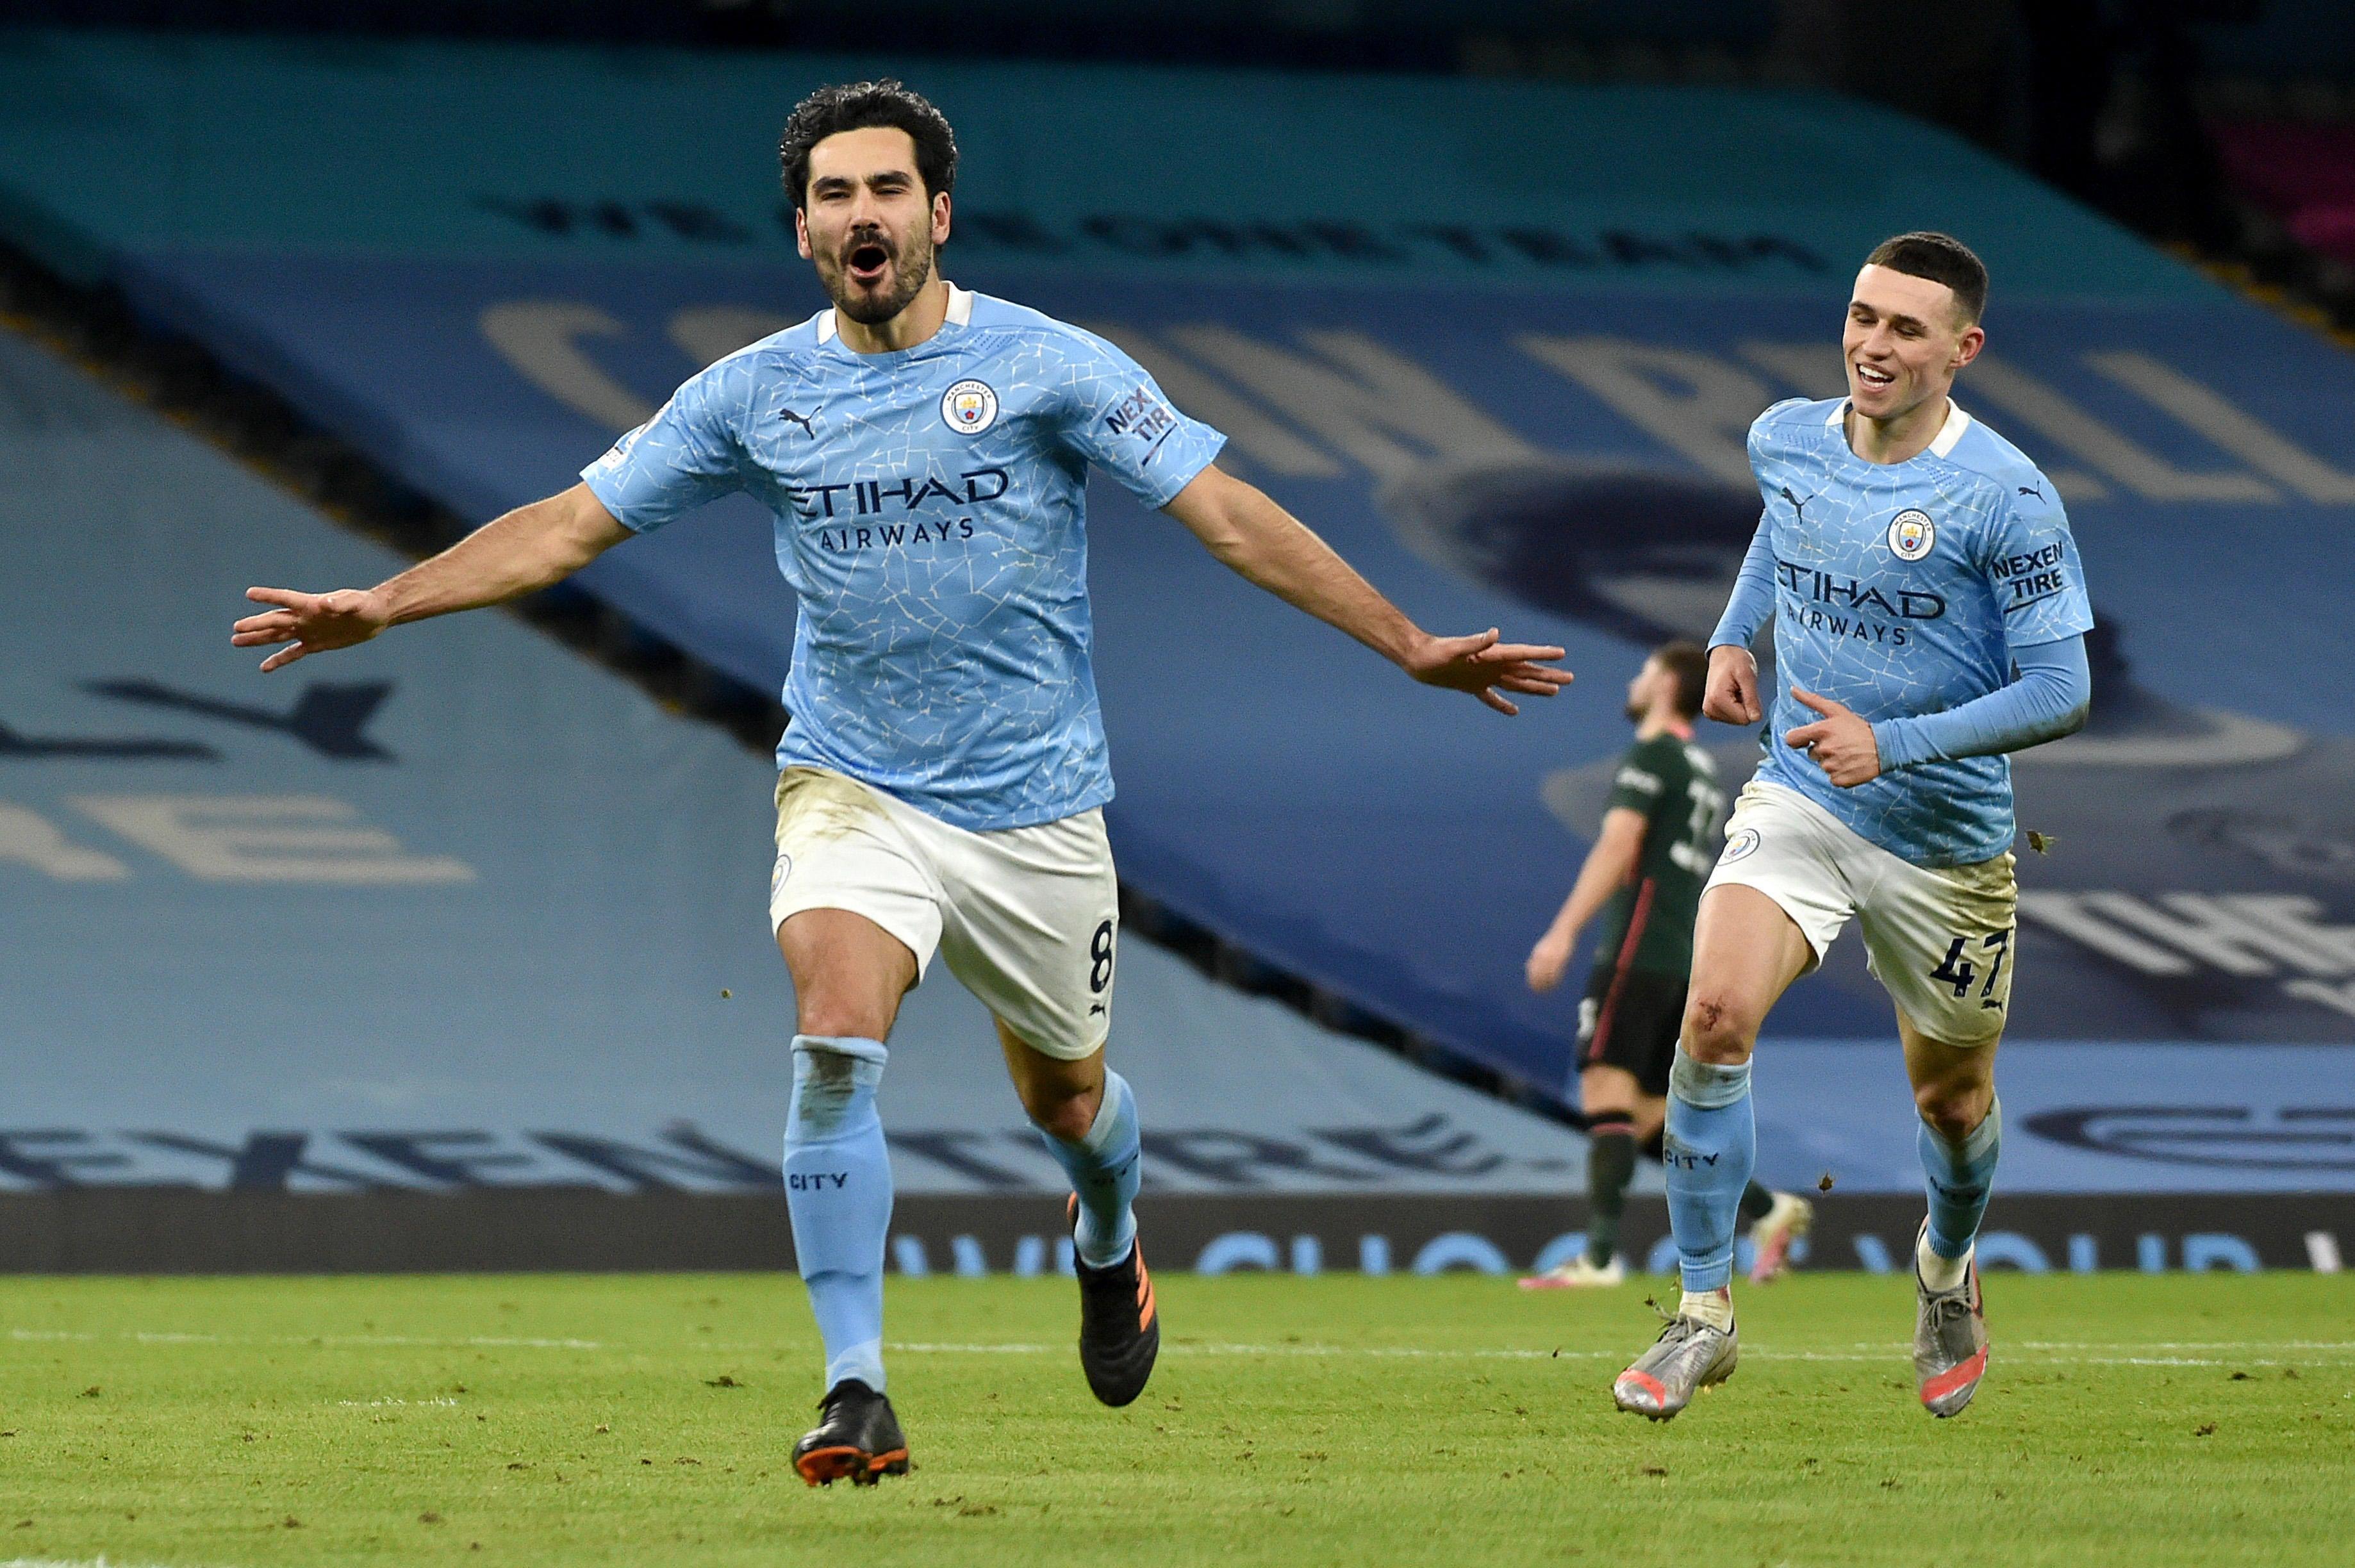 Manchester City Vs Tottenham Player Ratings Gundogan Once Again The Star As City Shut Down Son Cbssports Com